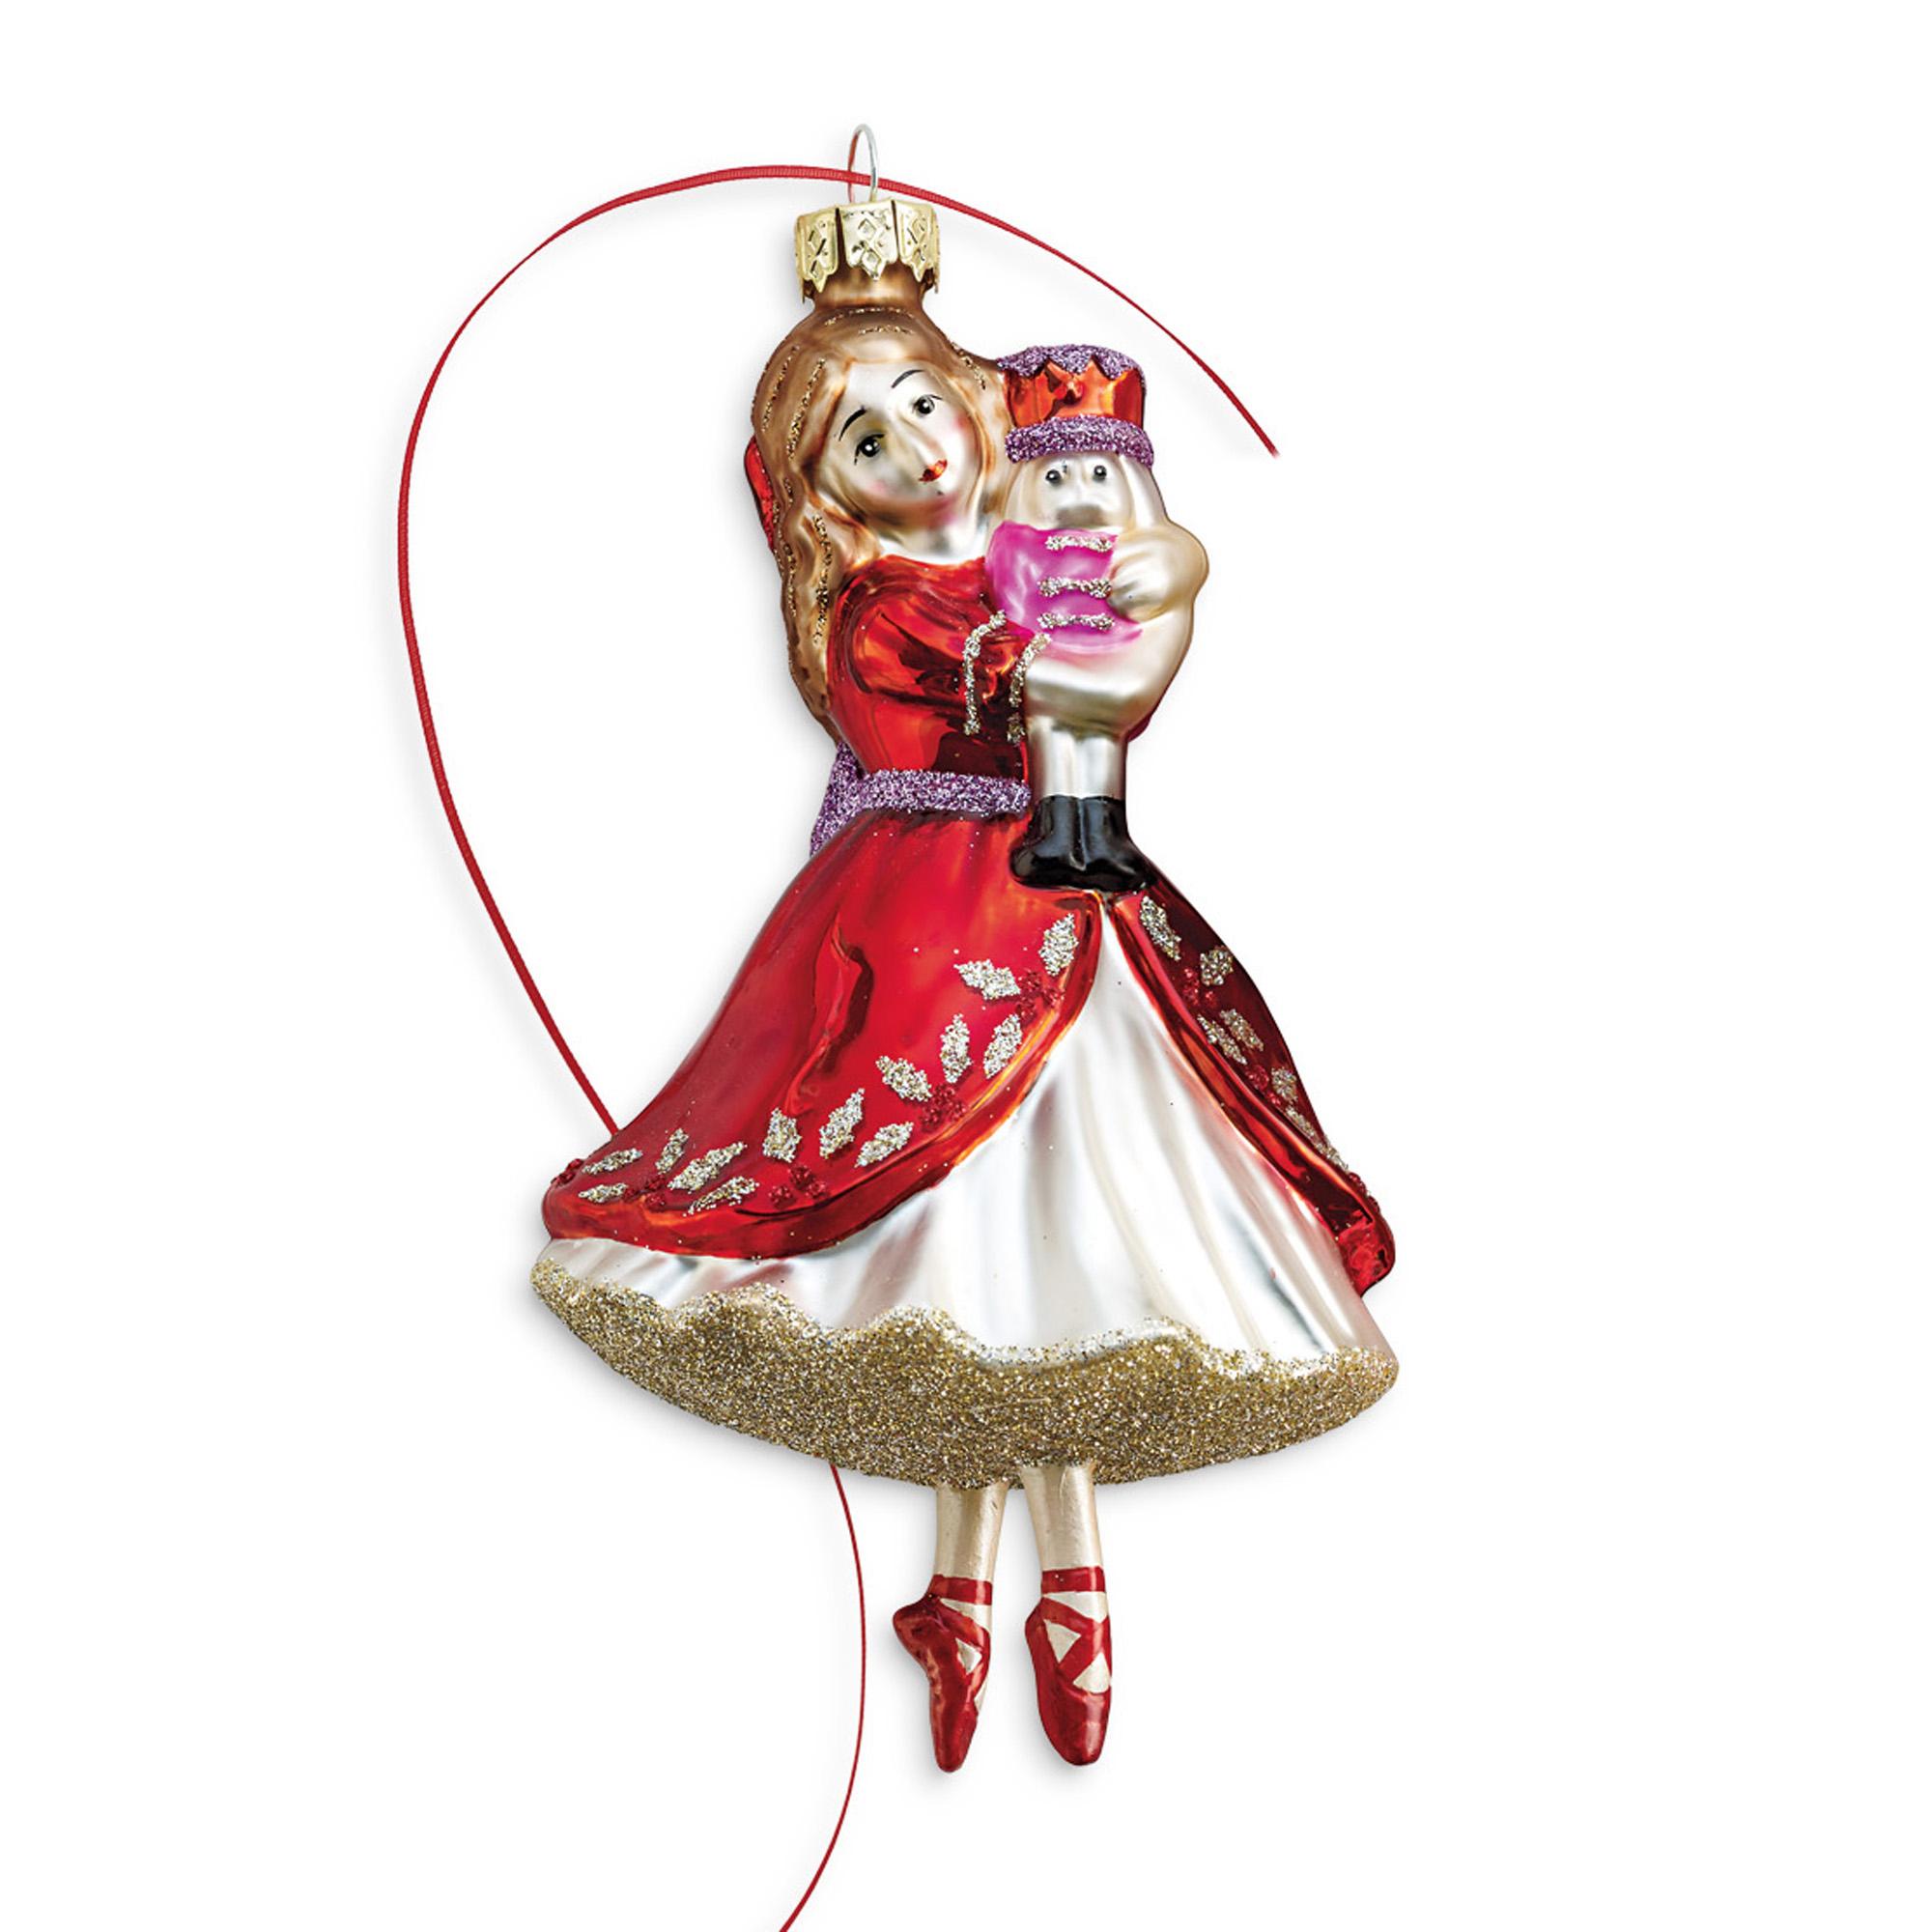 Clara Nutcracker Christmas Ornaments